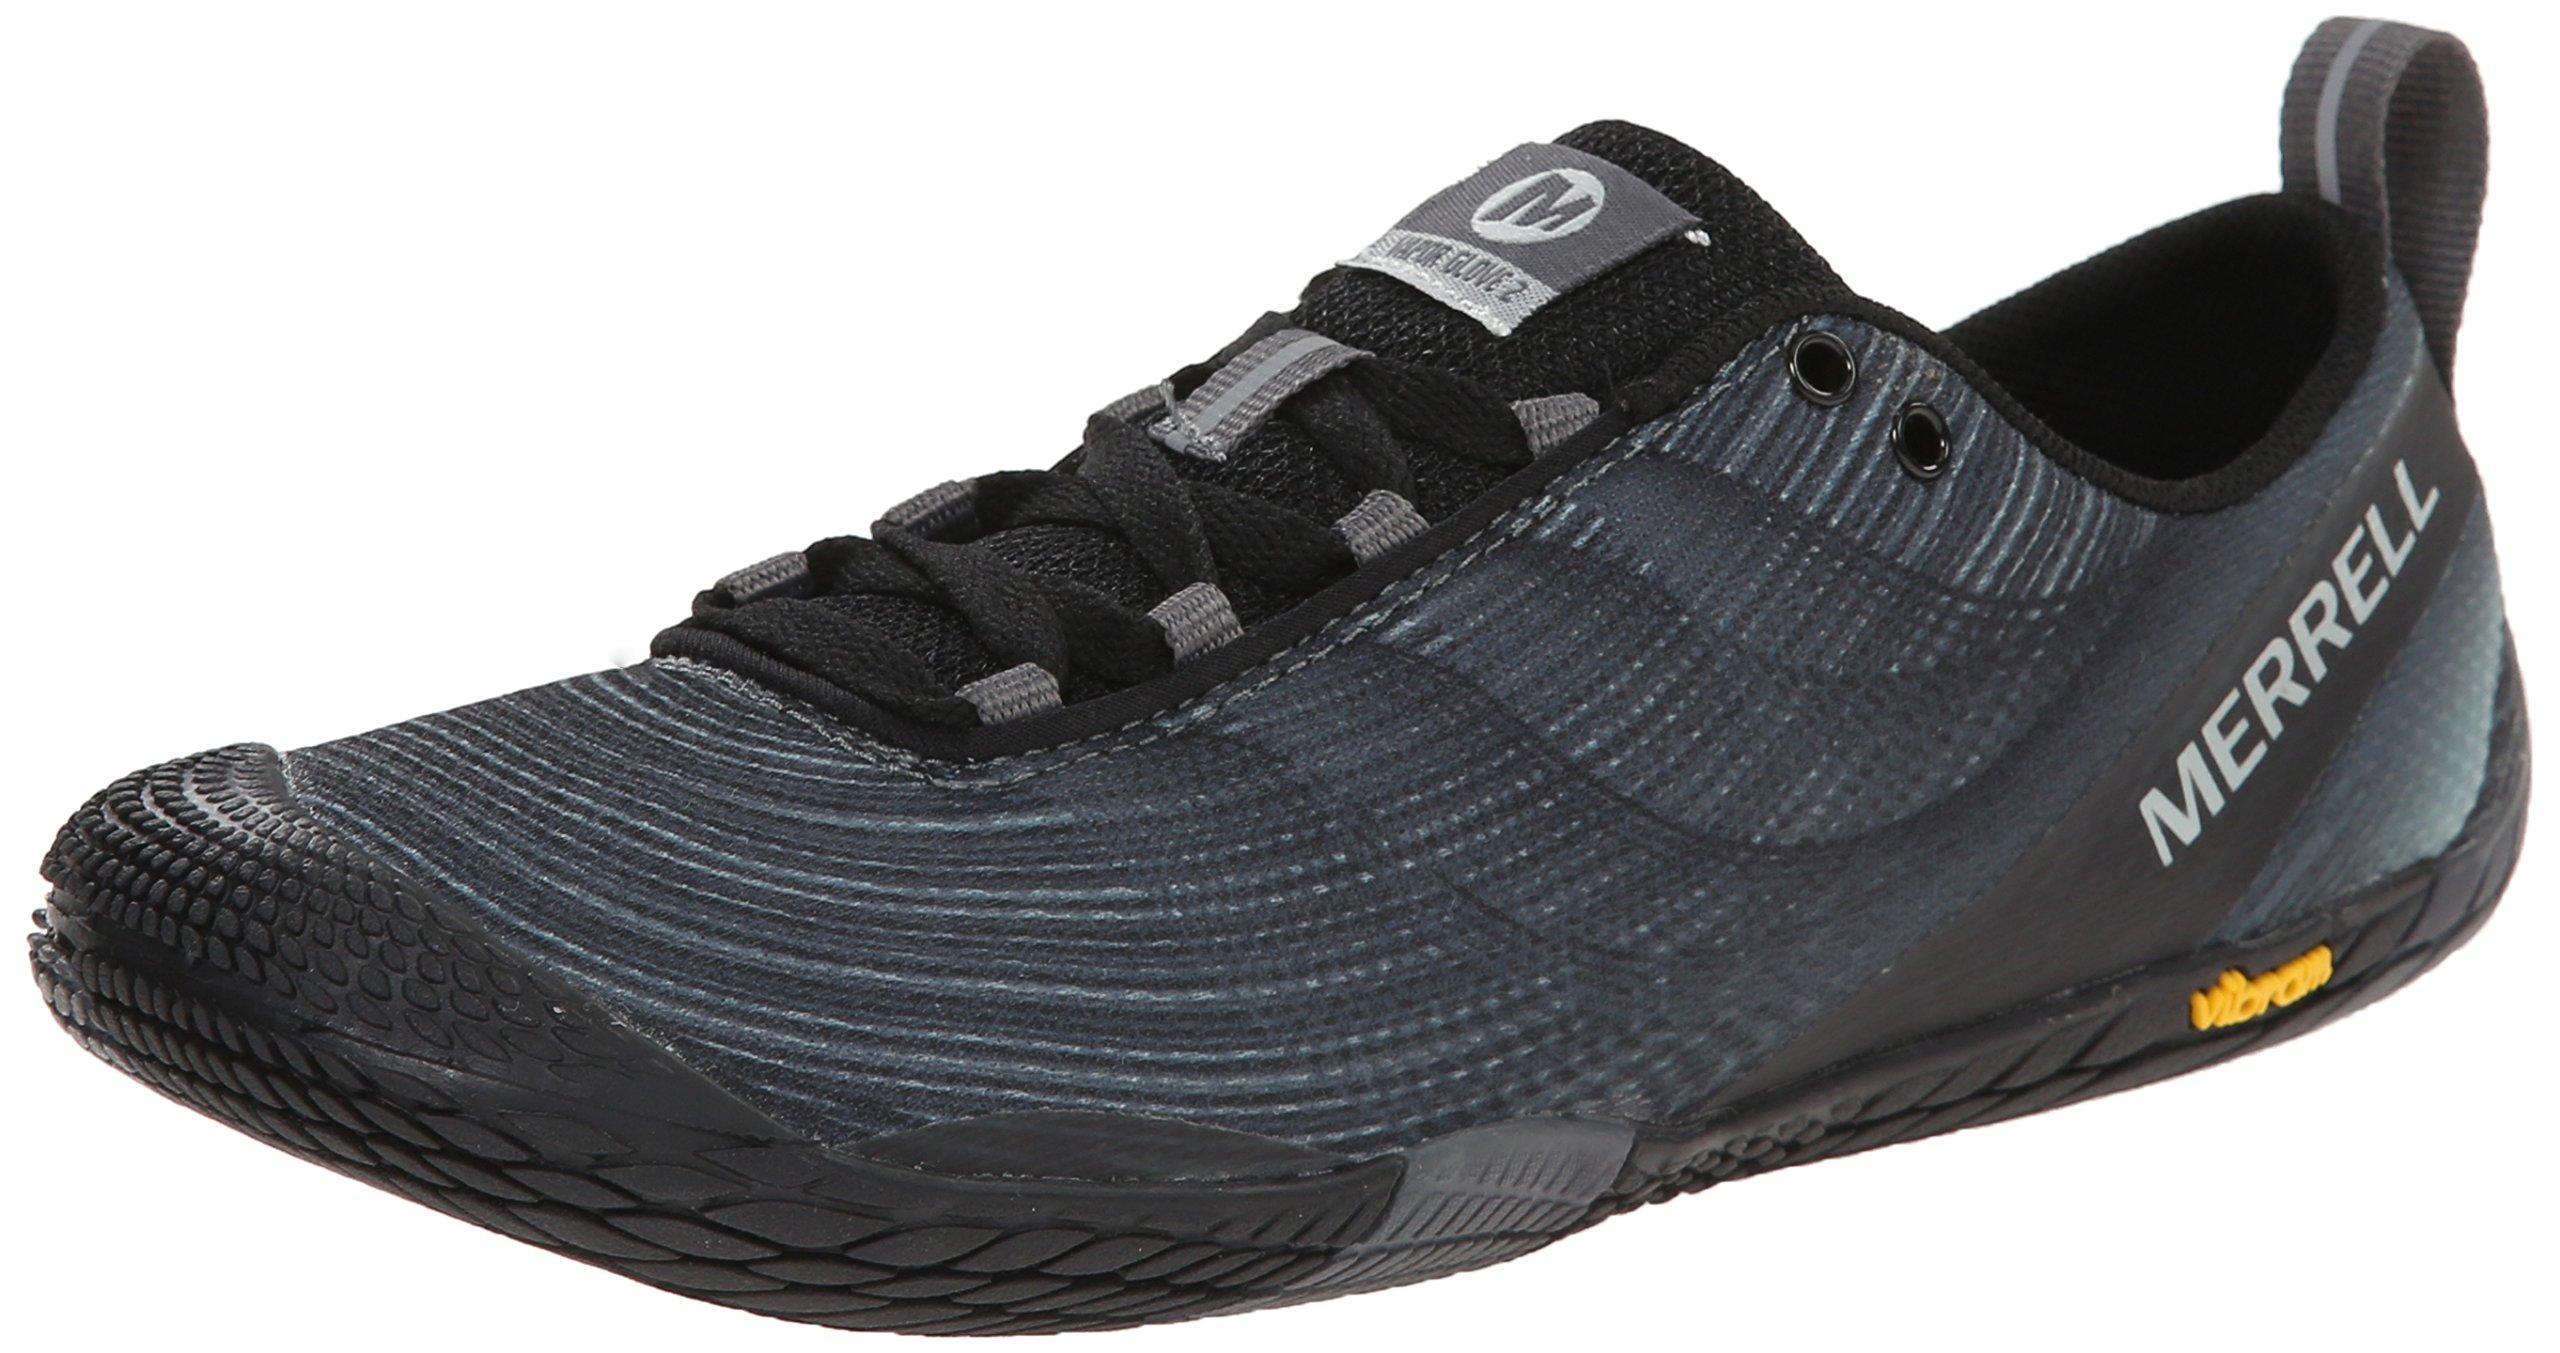 Merrell Women's Vapor Glove 2 Trail Running Shoe, Black/Castle Rock, 6 M US by Merrell (Image #1)